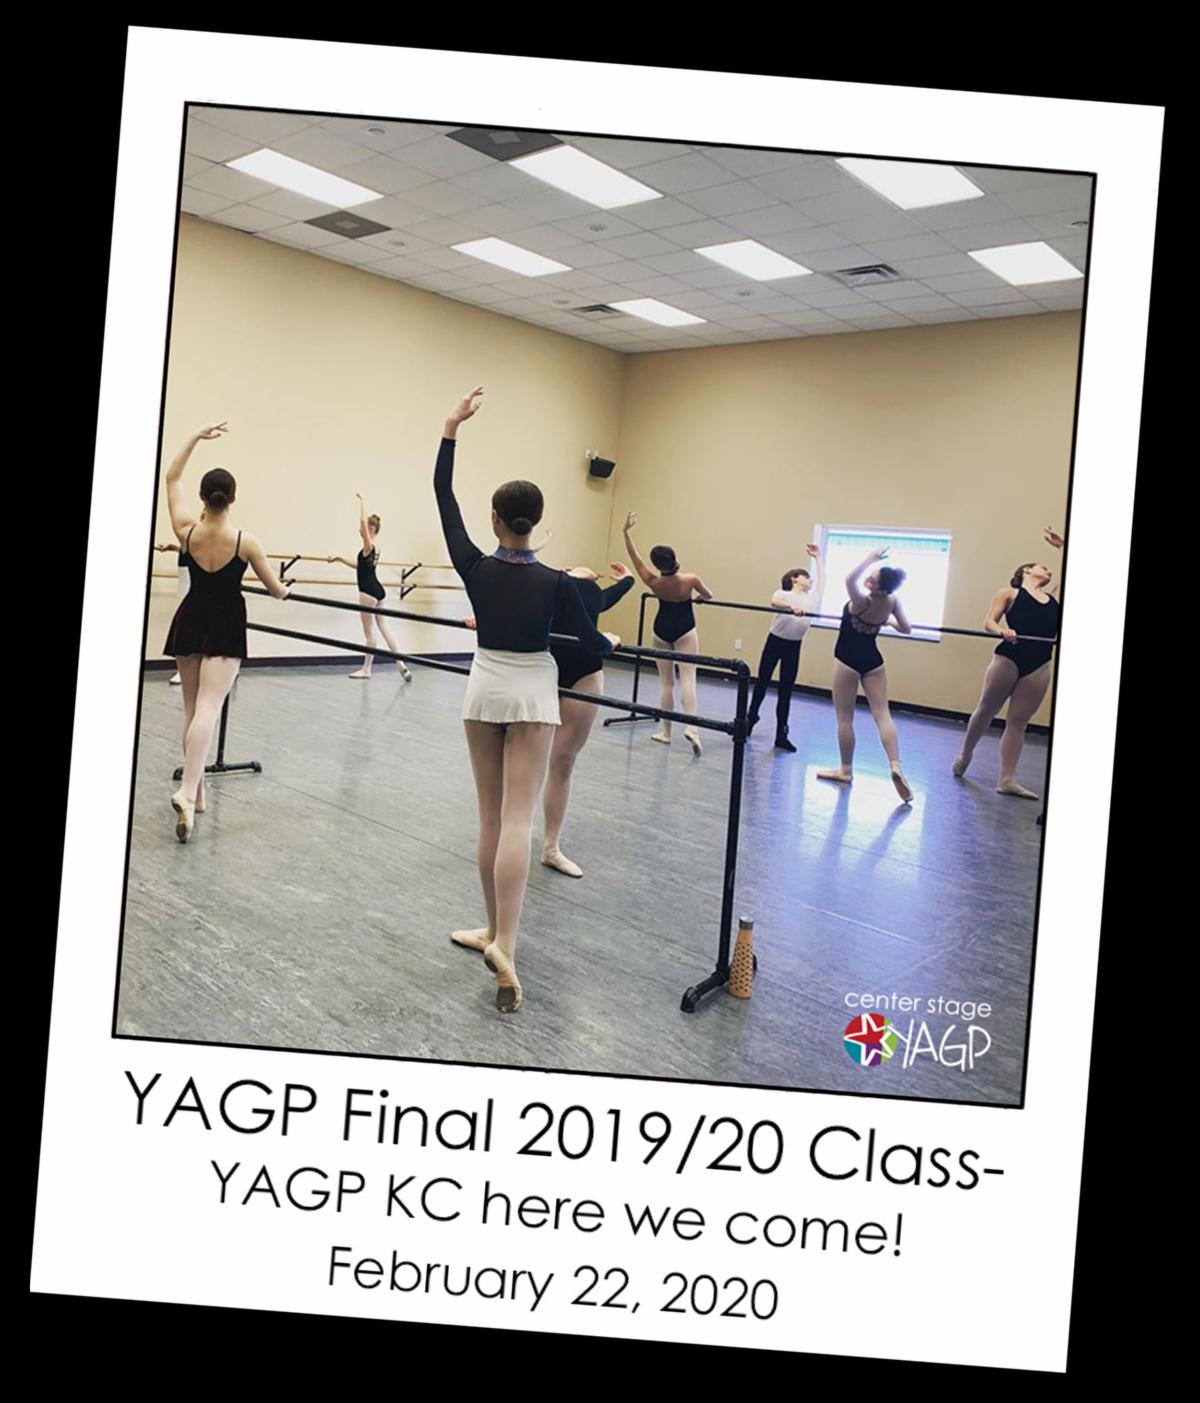 YAGP Rehearsal Snapshot 2-23-20